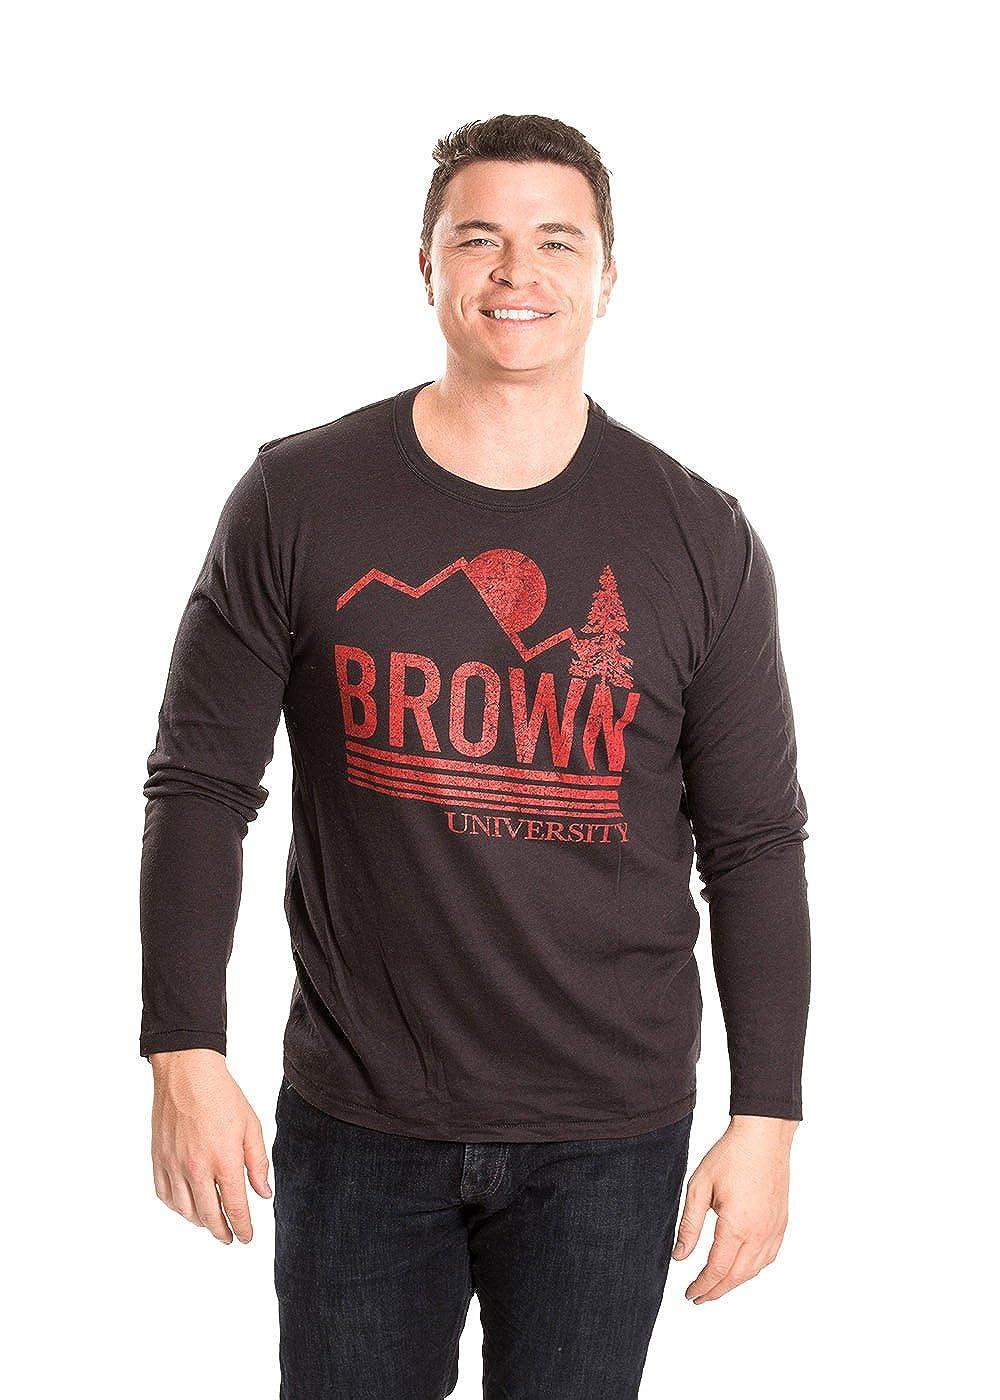 Small Alma Mater NCAA Mens Long Sleeve T-Shirt Brown Bears